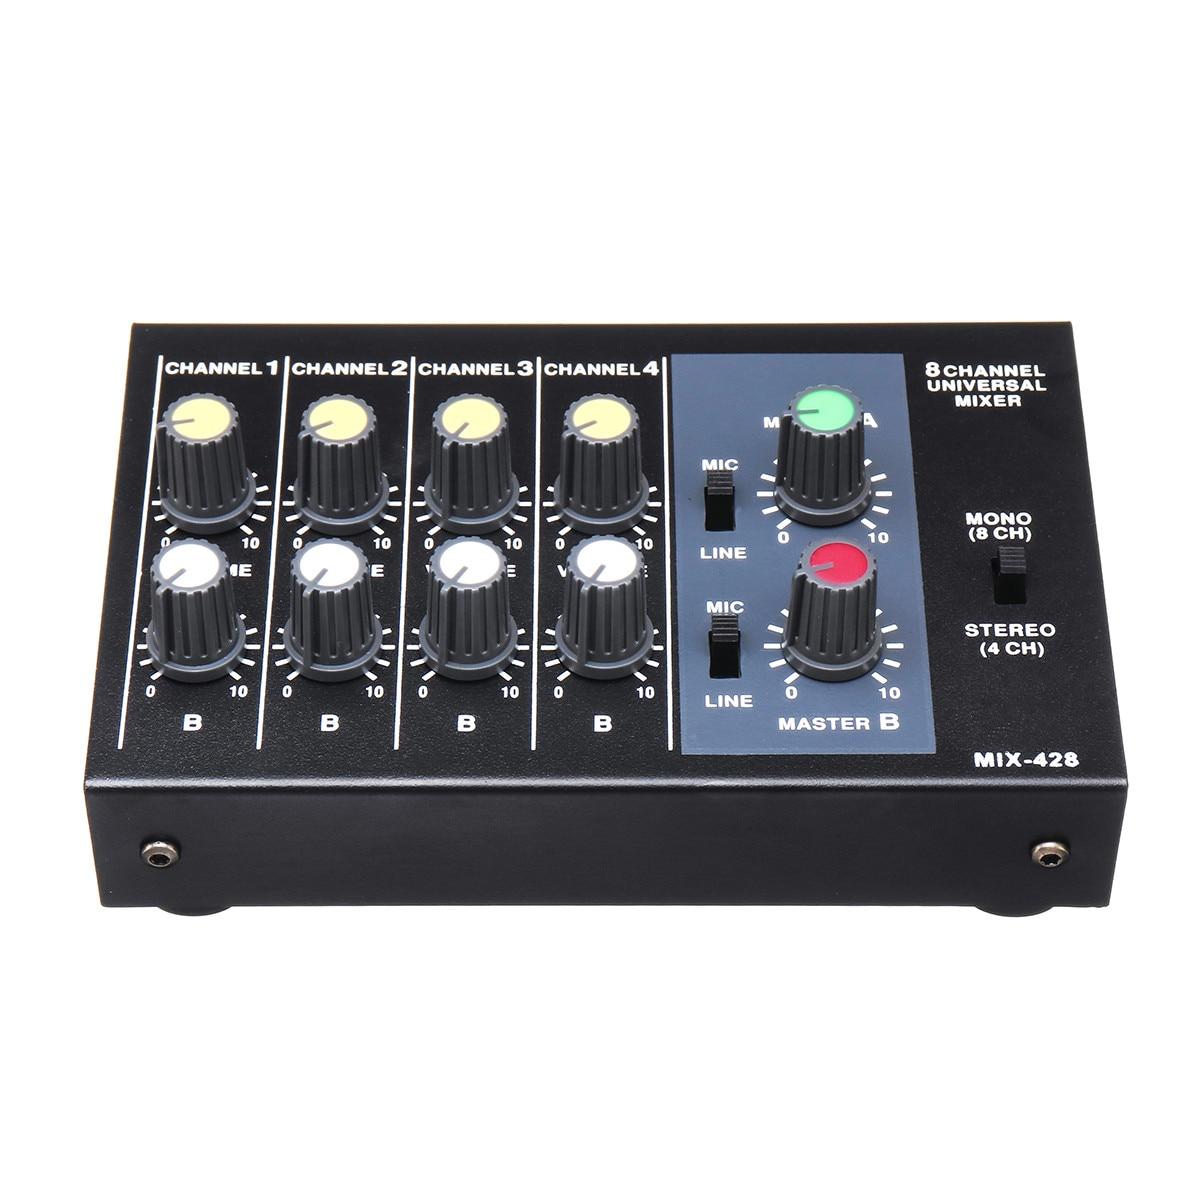 48V 5W Multi-Kanal Digital Mixing Konsole Karaoke Universal Mixer Konsole Mono/Stereo Mikrofon Mischer Konsole anpassung Panel